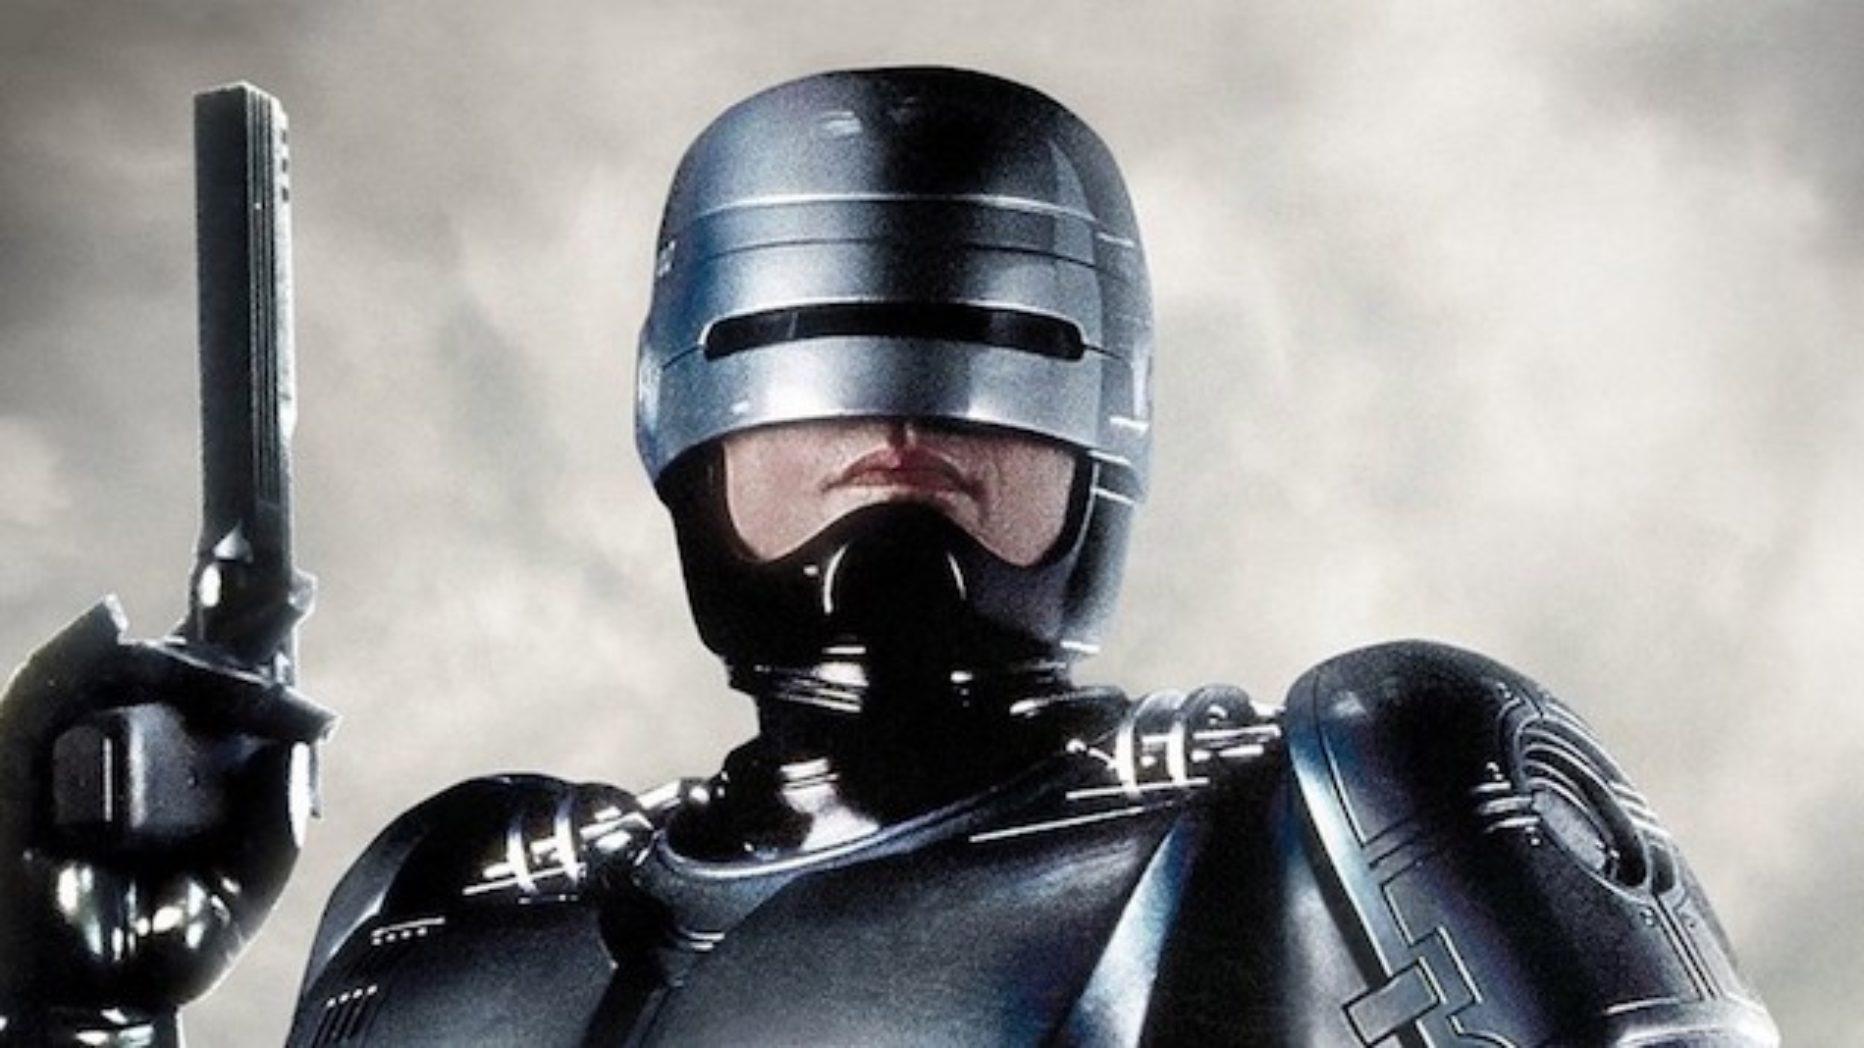 Alex J. Murphy (Peter Weller) - RoboCop